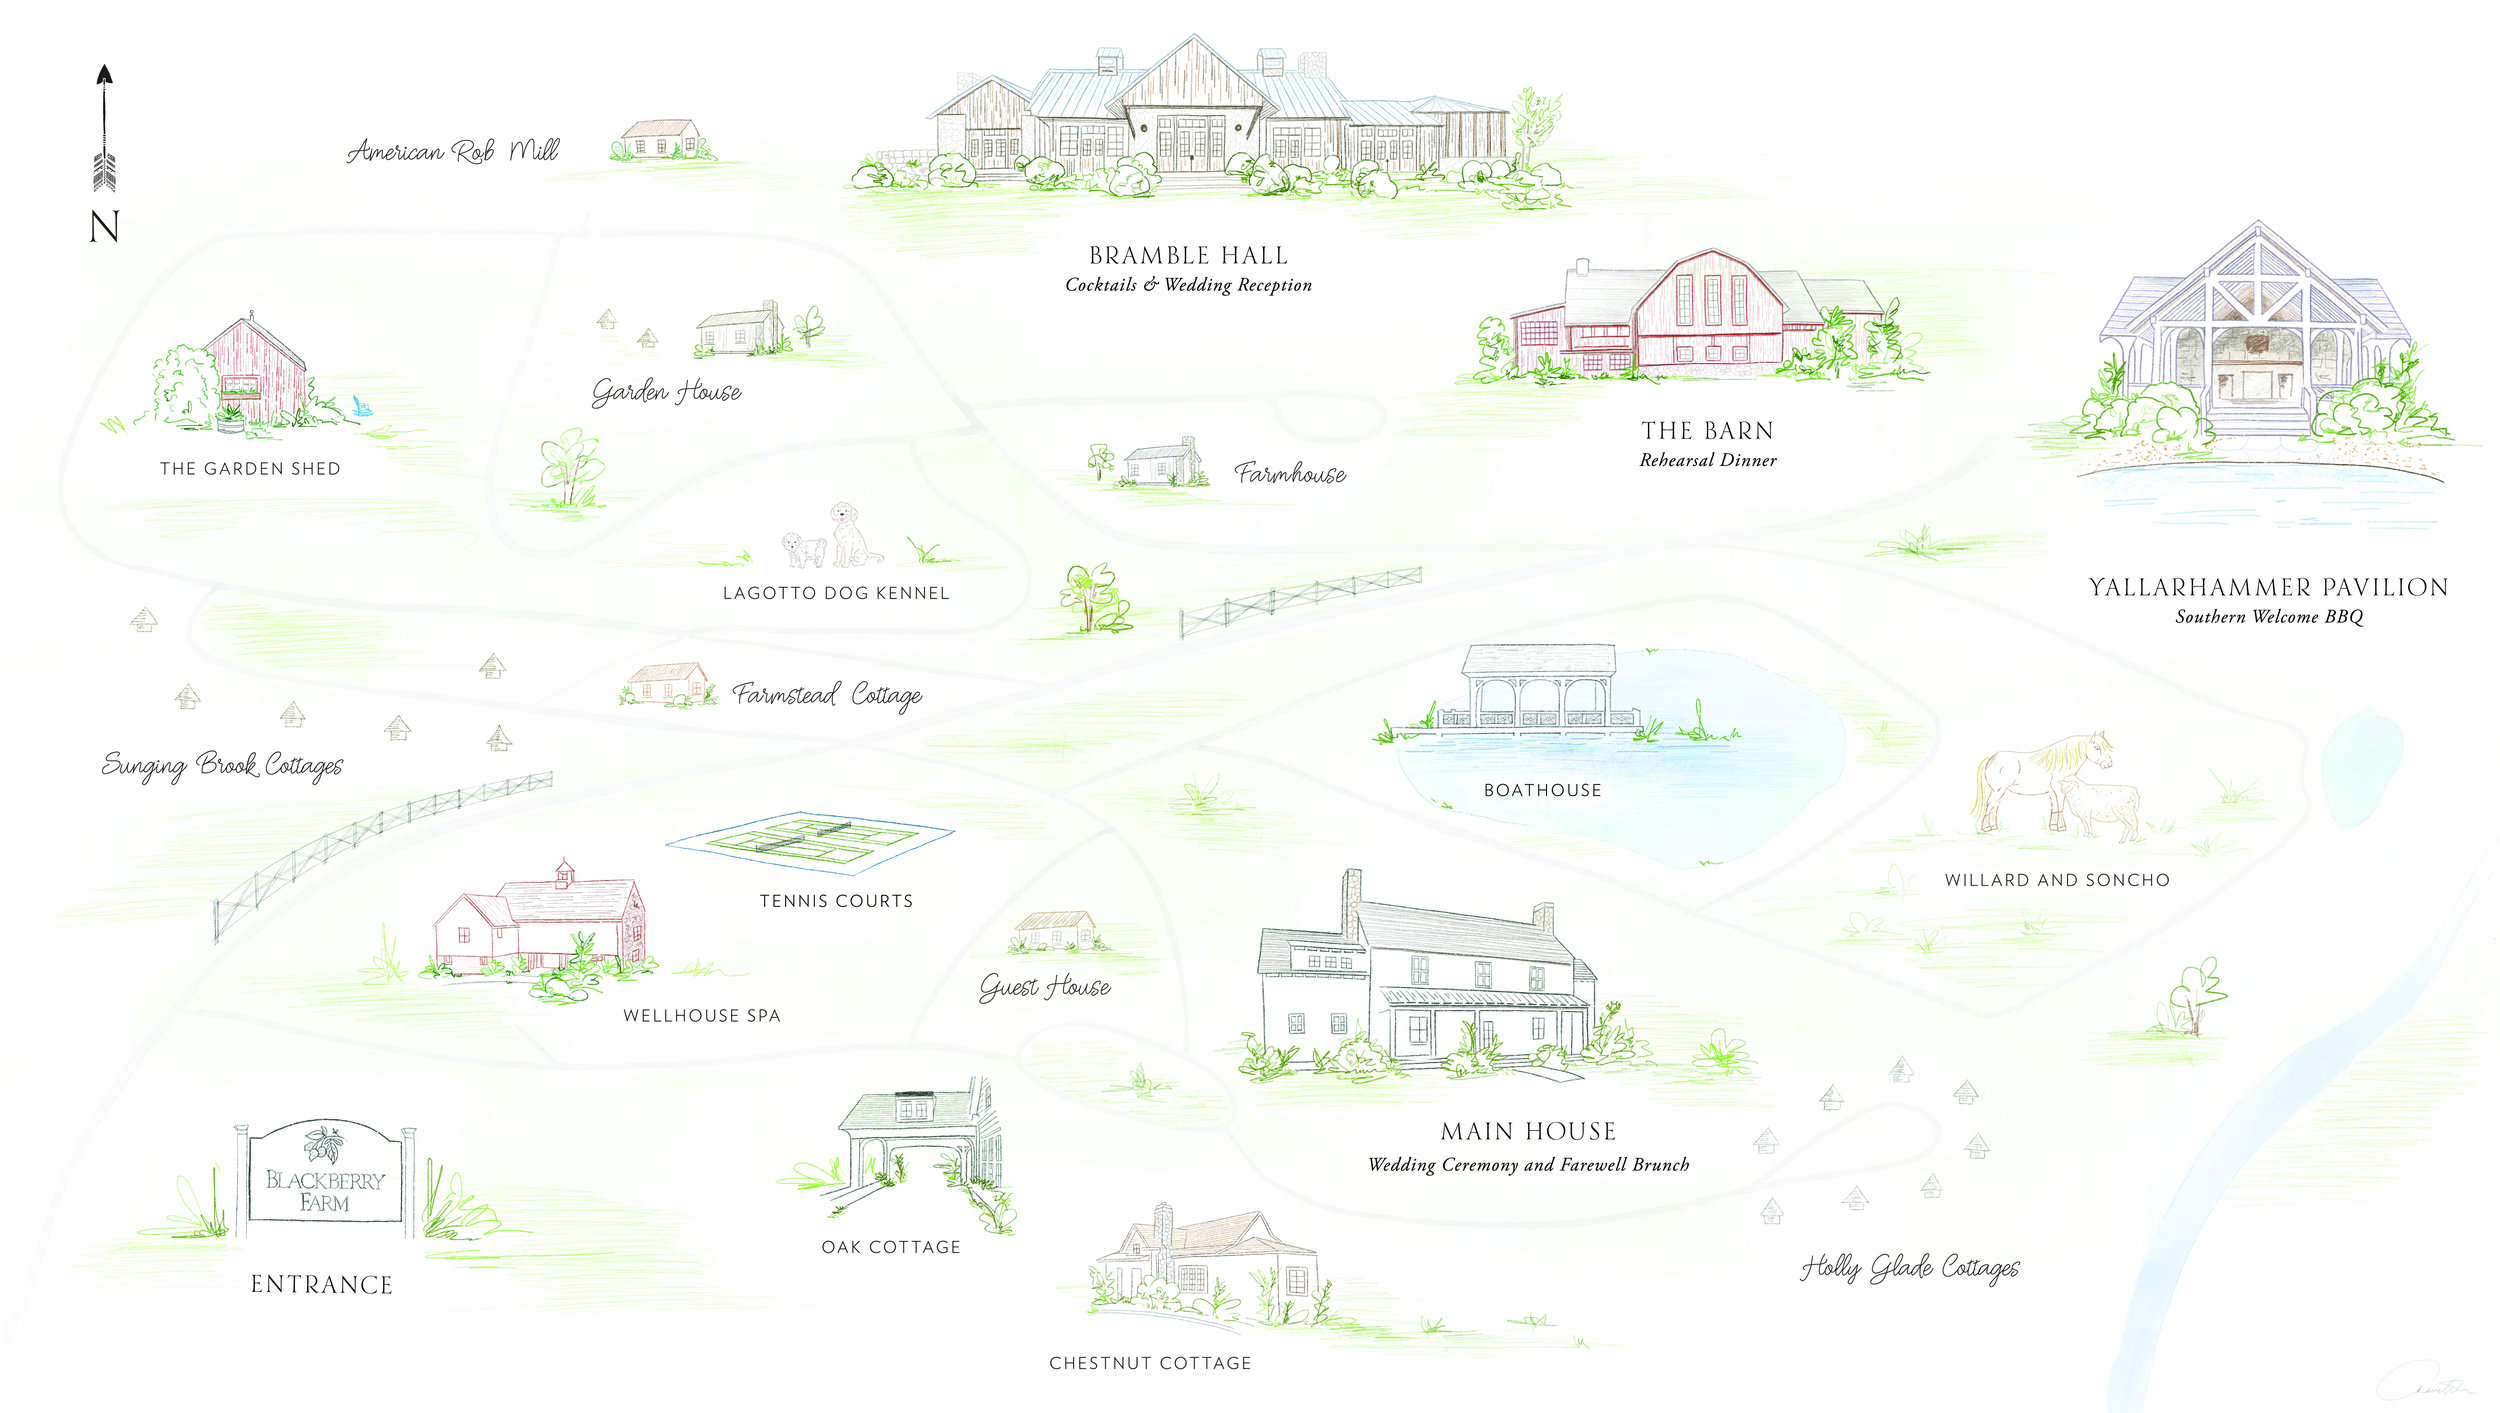 Blackberry Farm custom venue illustration | by www.chavelli.com